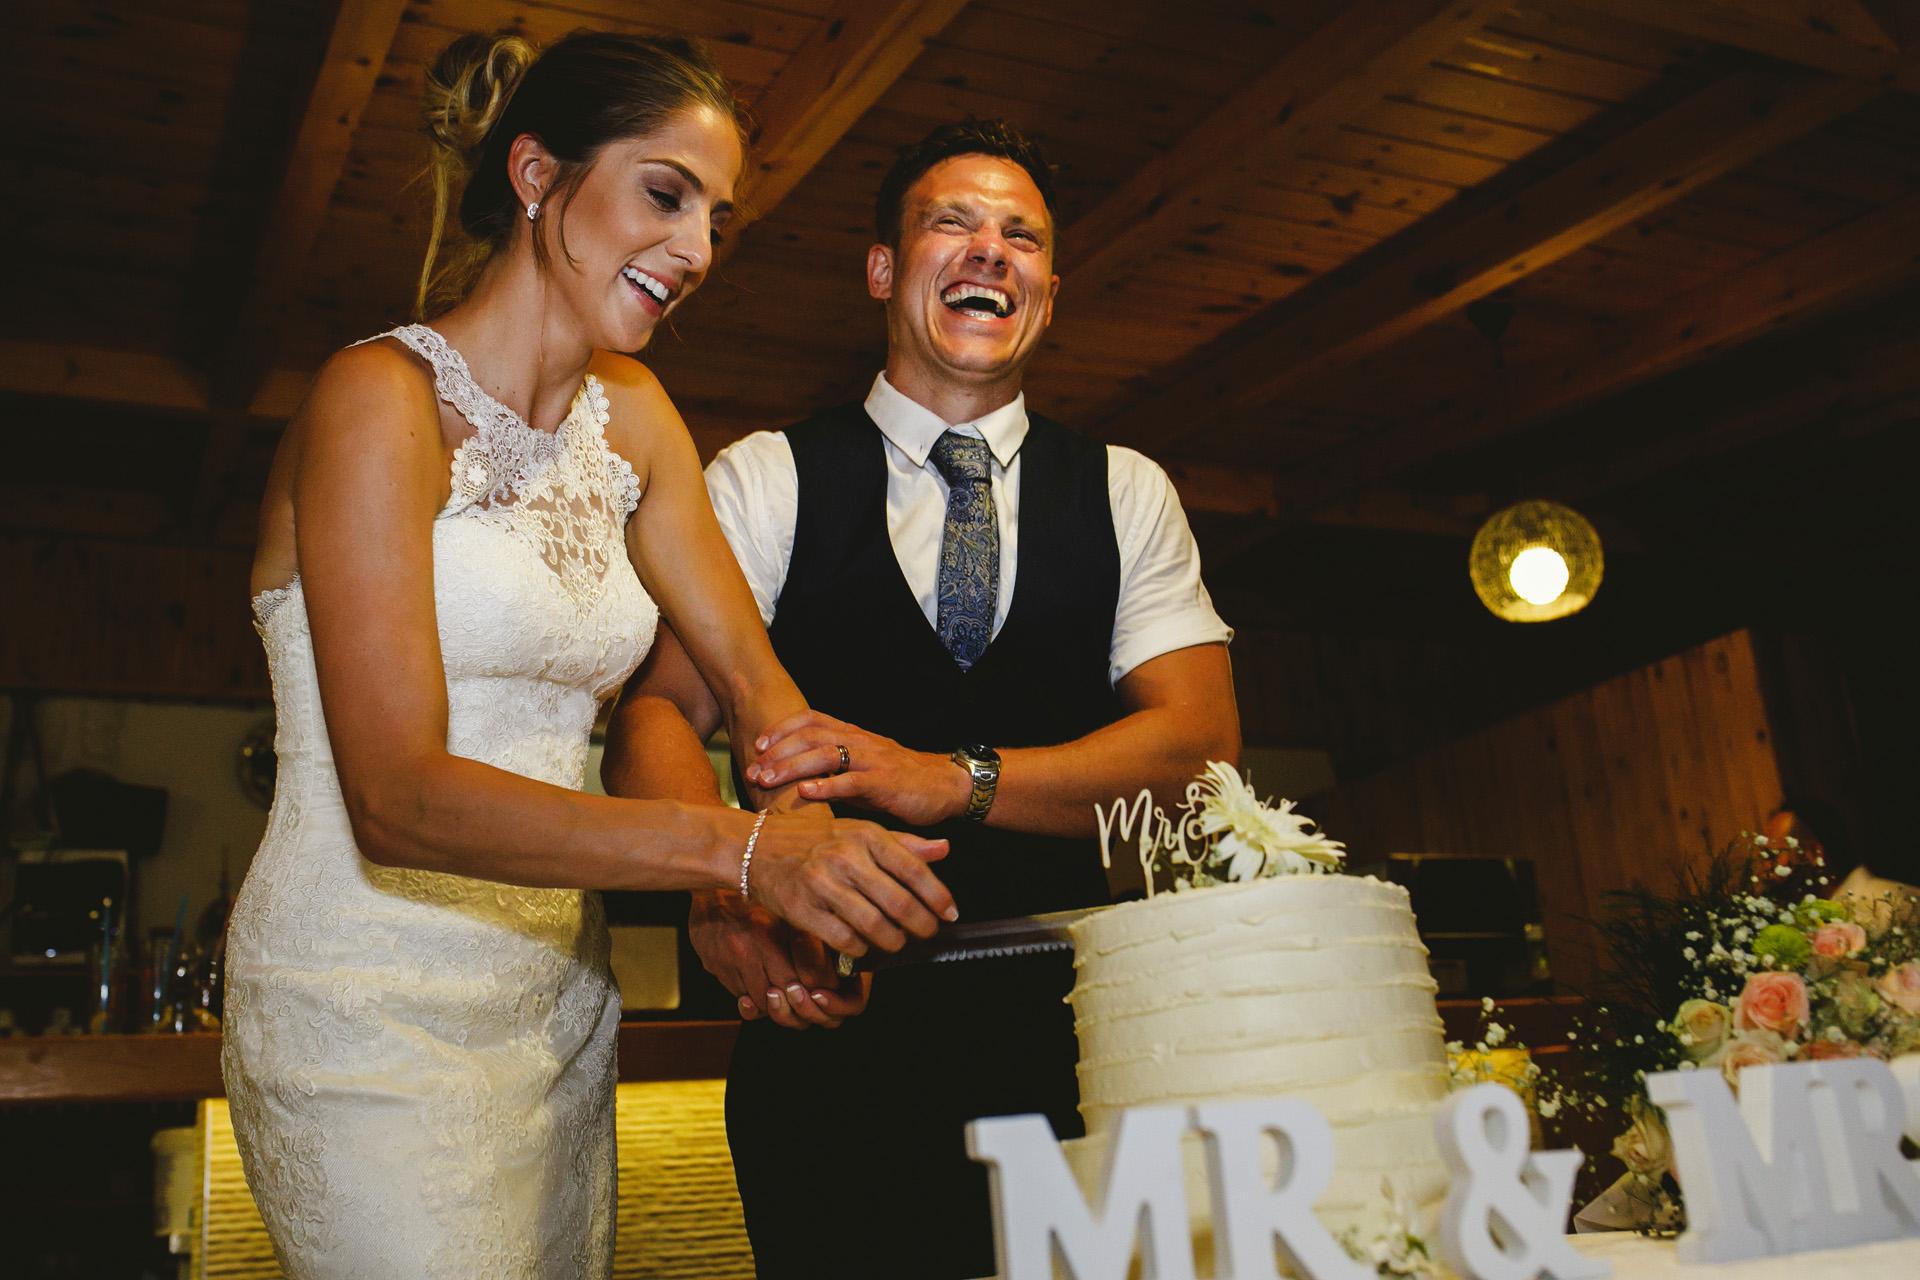 Fethiye, Turkey Wedding Cake Cutting Image | The wedding cake cutting ceremony was such a playful moment